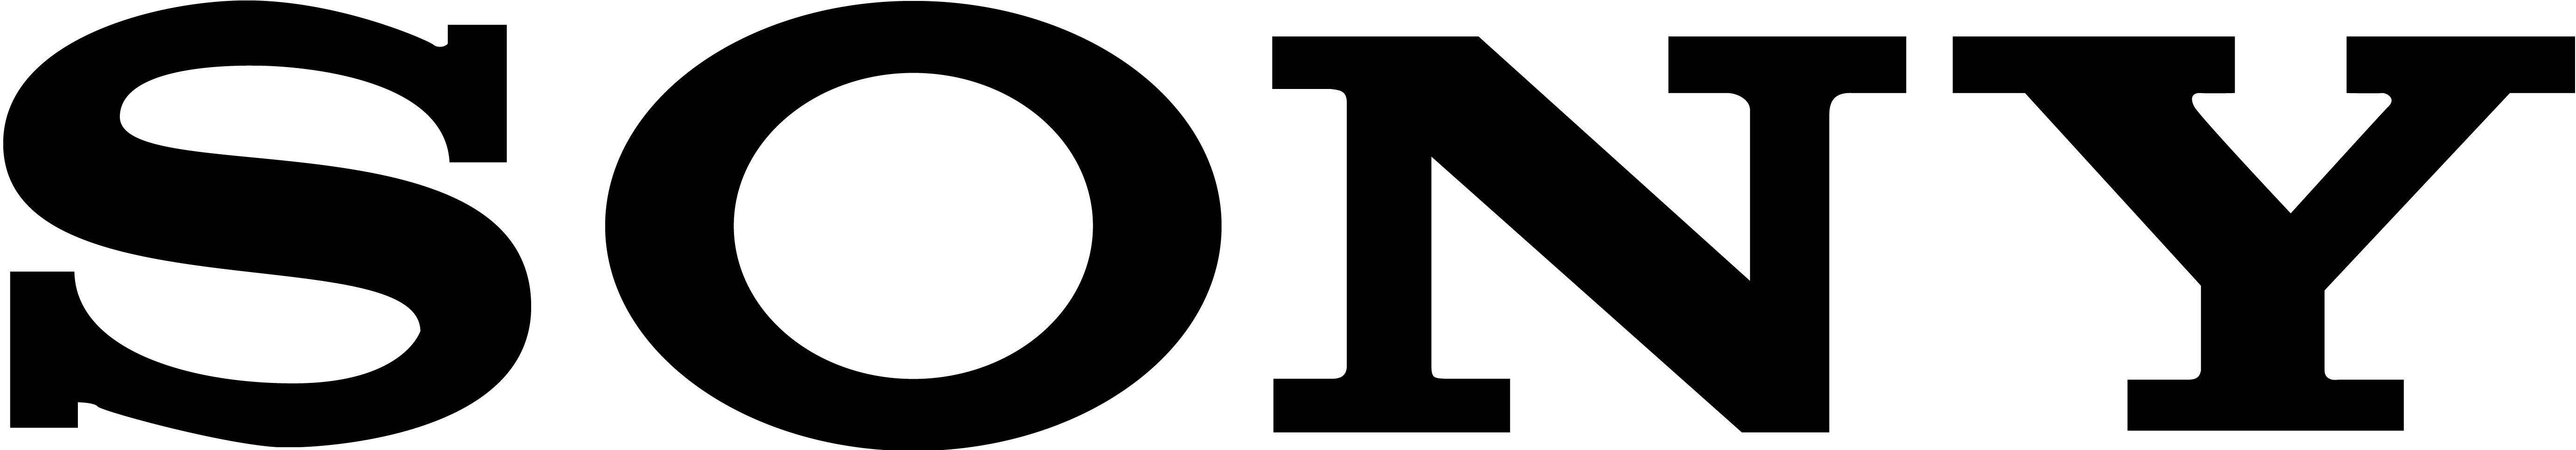 Sony Vaio Logo Vector EPS Free Download Logo Image.